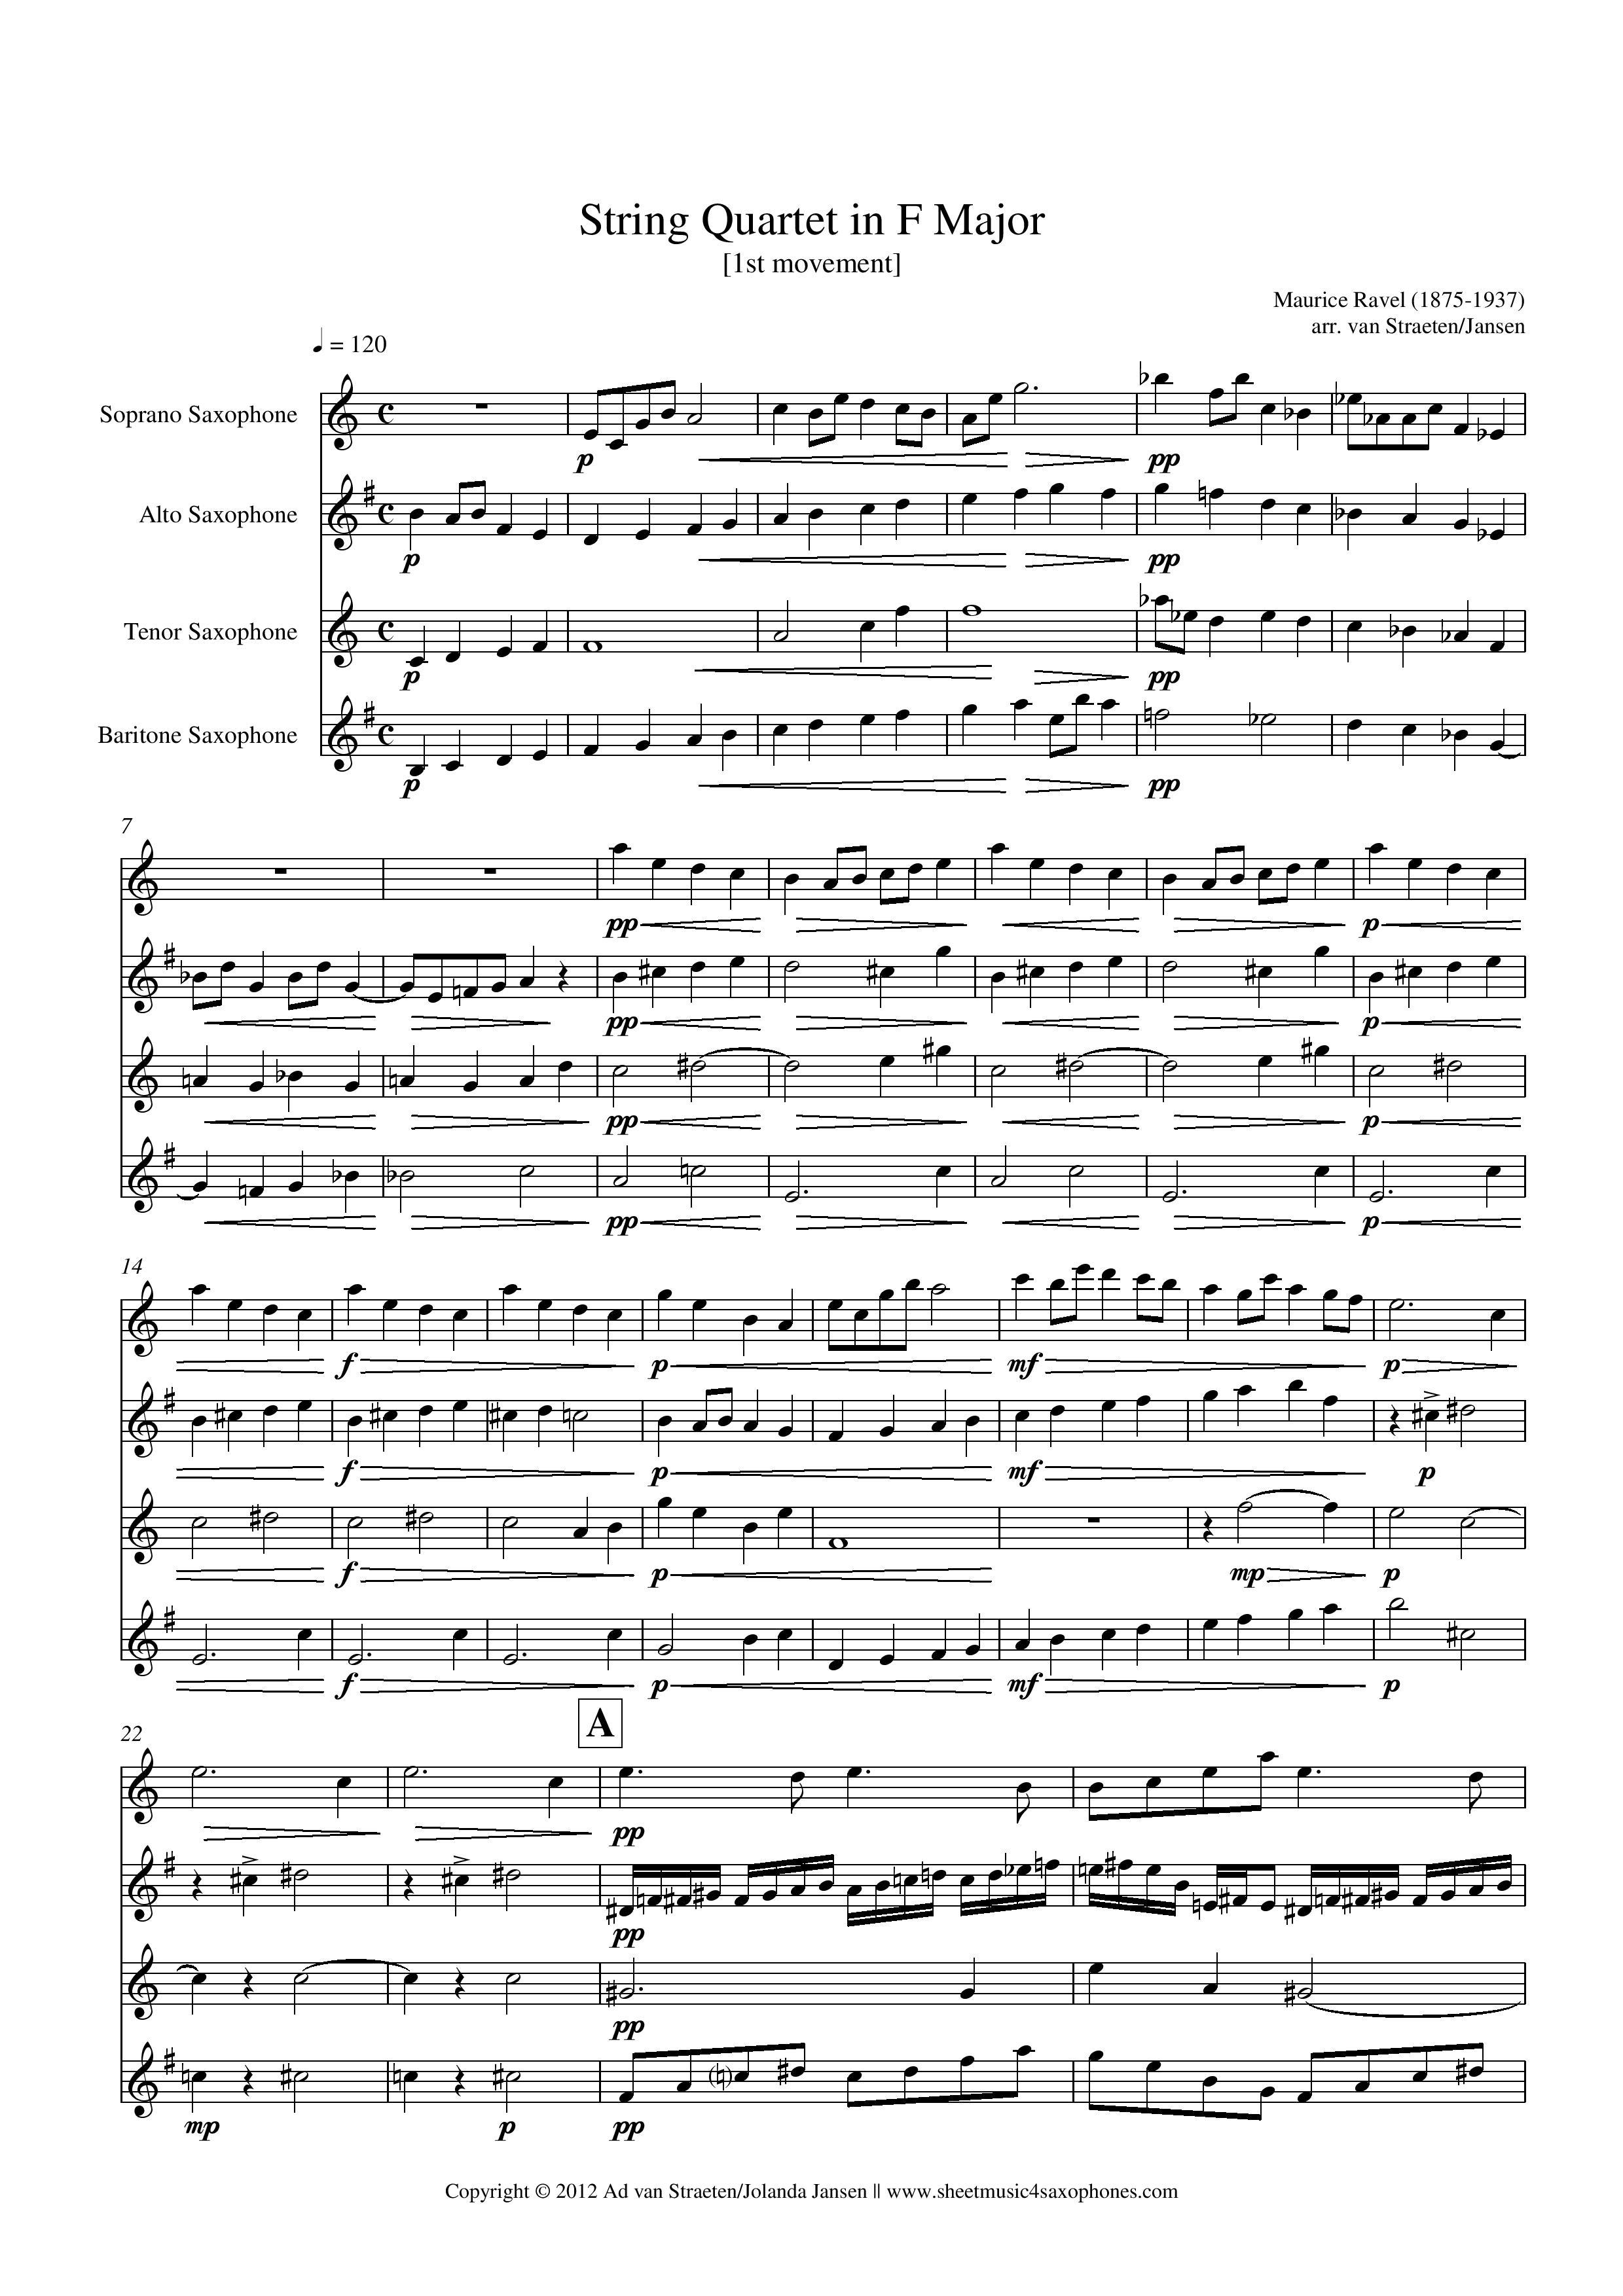 String Quartet in F Major, Movement 4 - Score